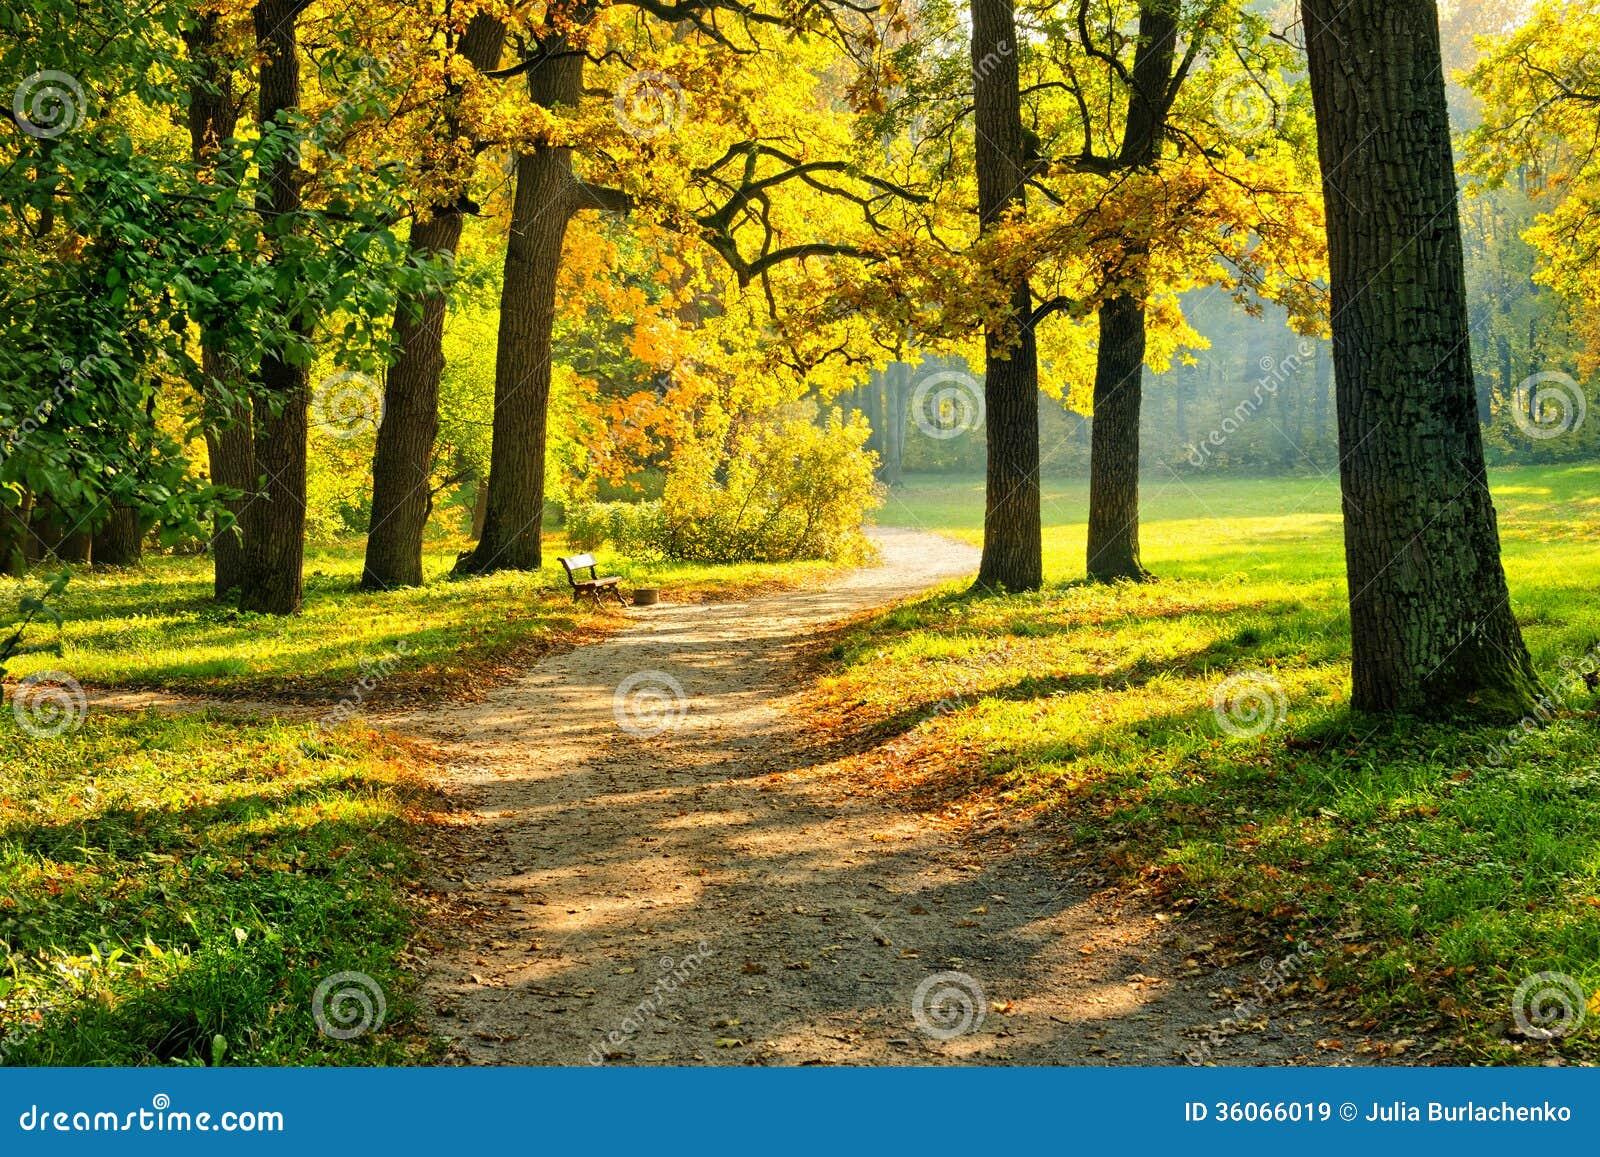 Autumn In The Park Forest. Vivid Golden Yellow Orange